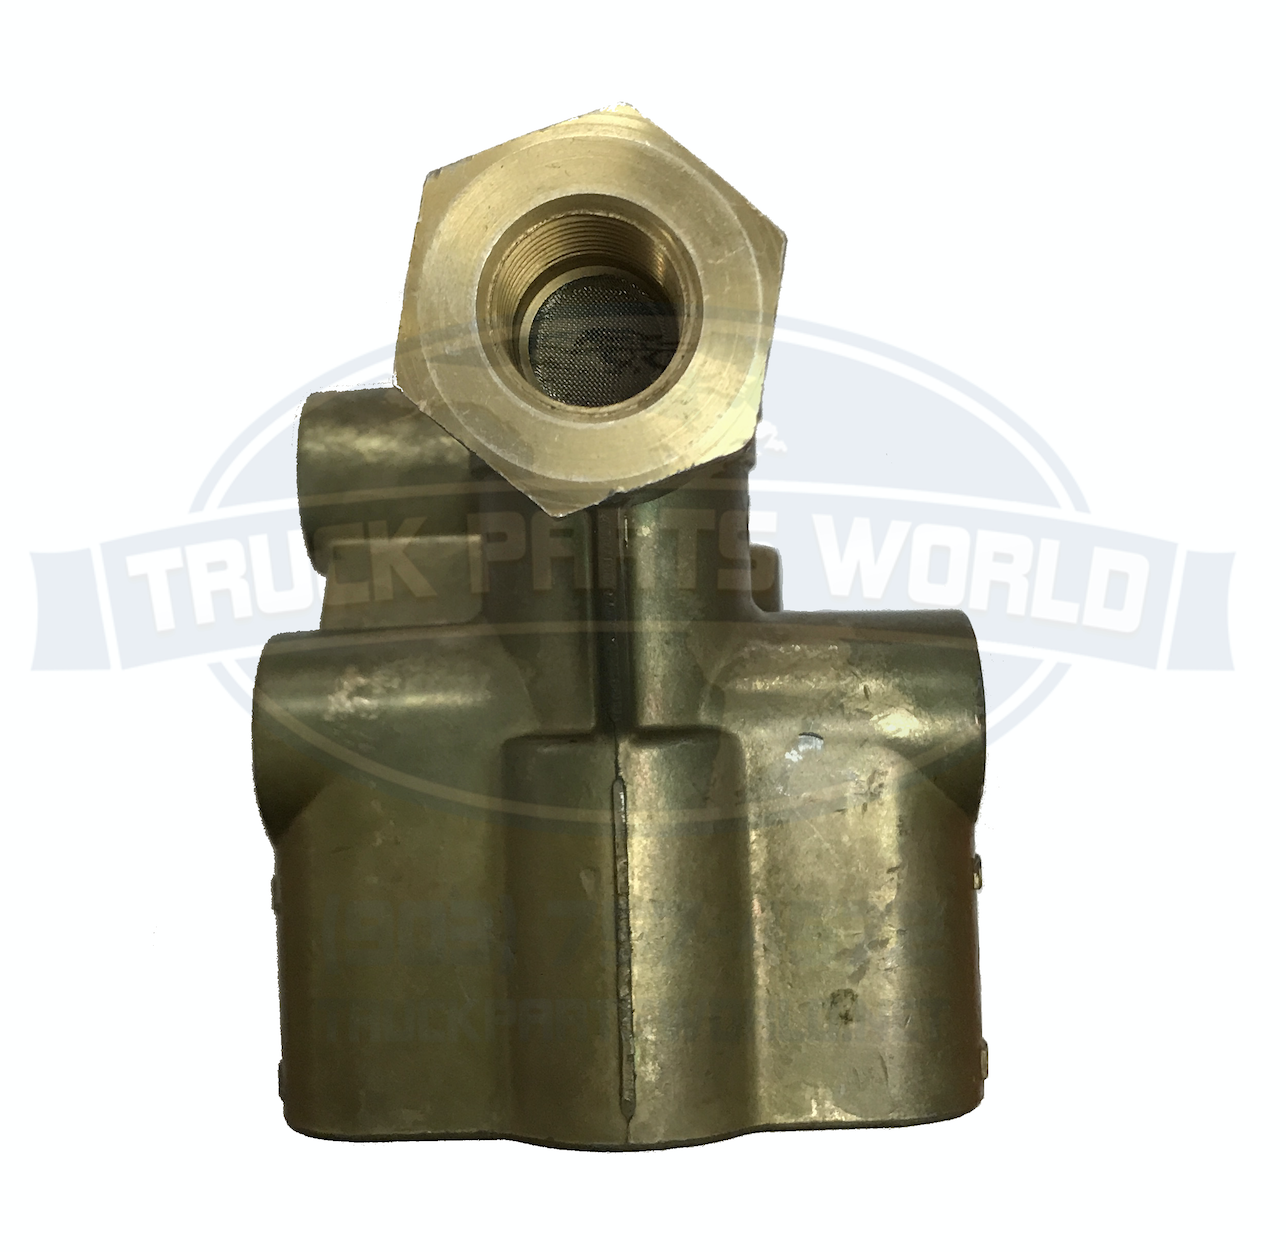 Spring Brake Valve Replaces Sealco 110800 H-30174